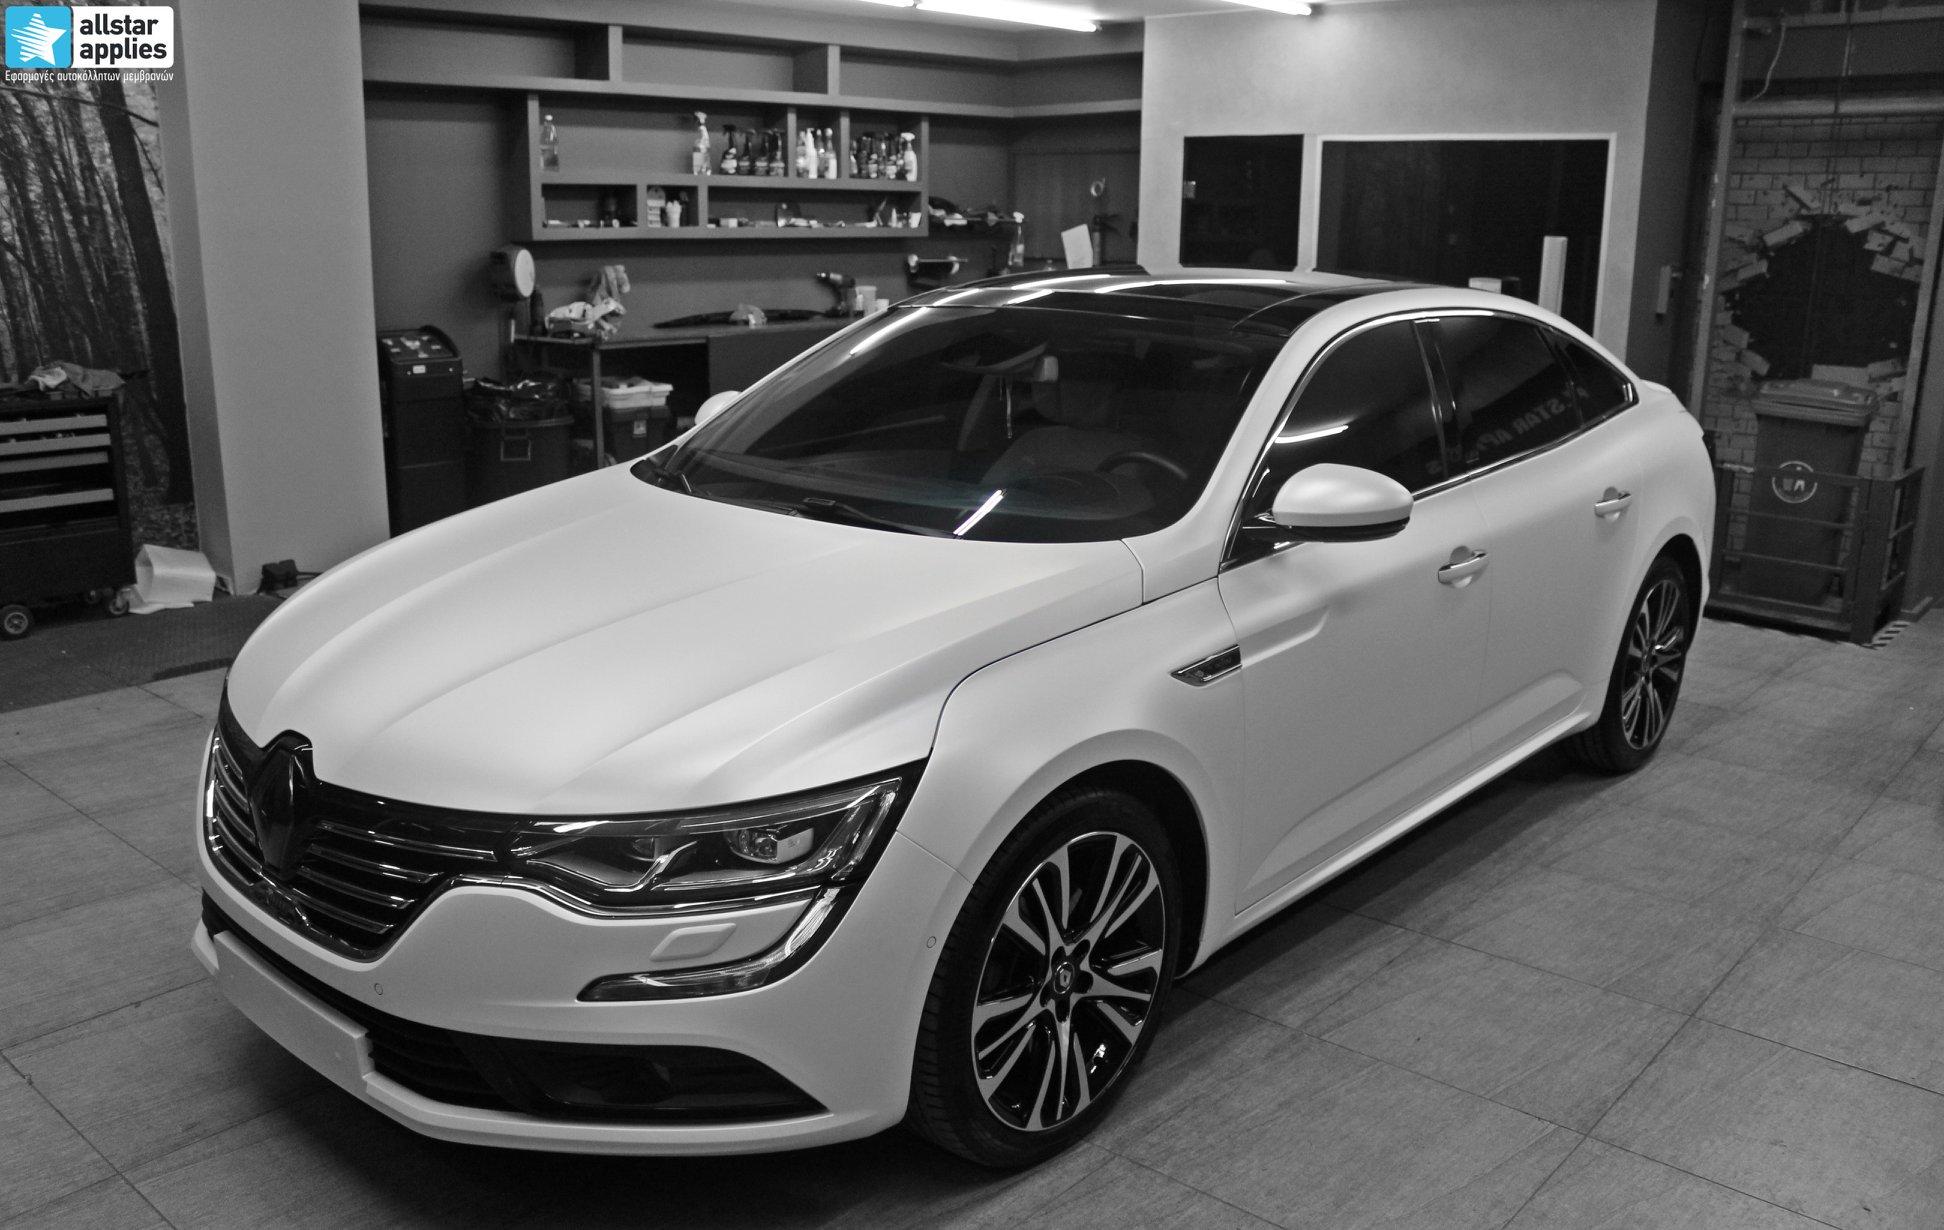 Renault Talisman - Satin Pearl White (1)